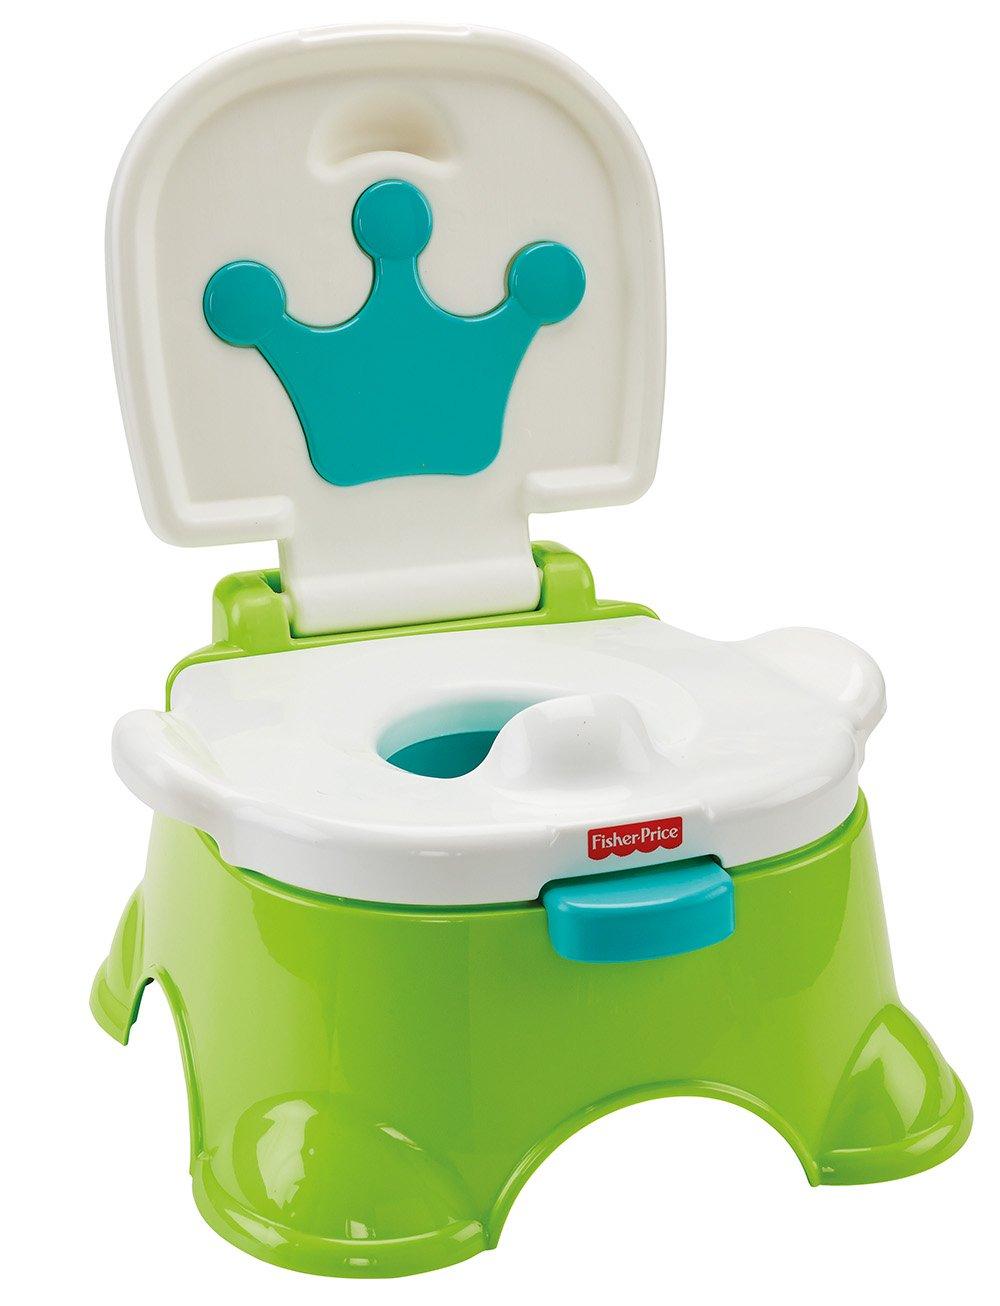 Fisher-Price Dlt00 Royal Stepstool Potty